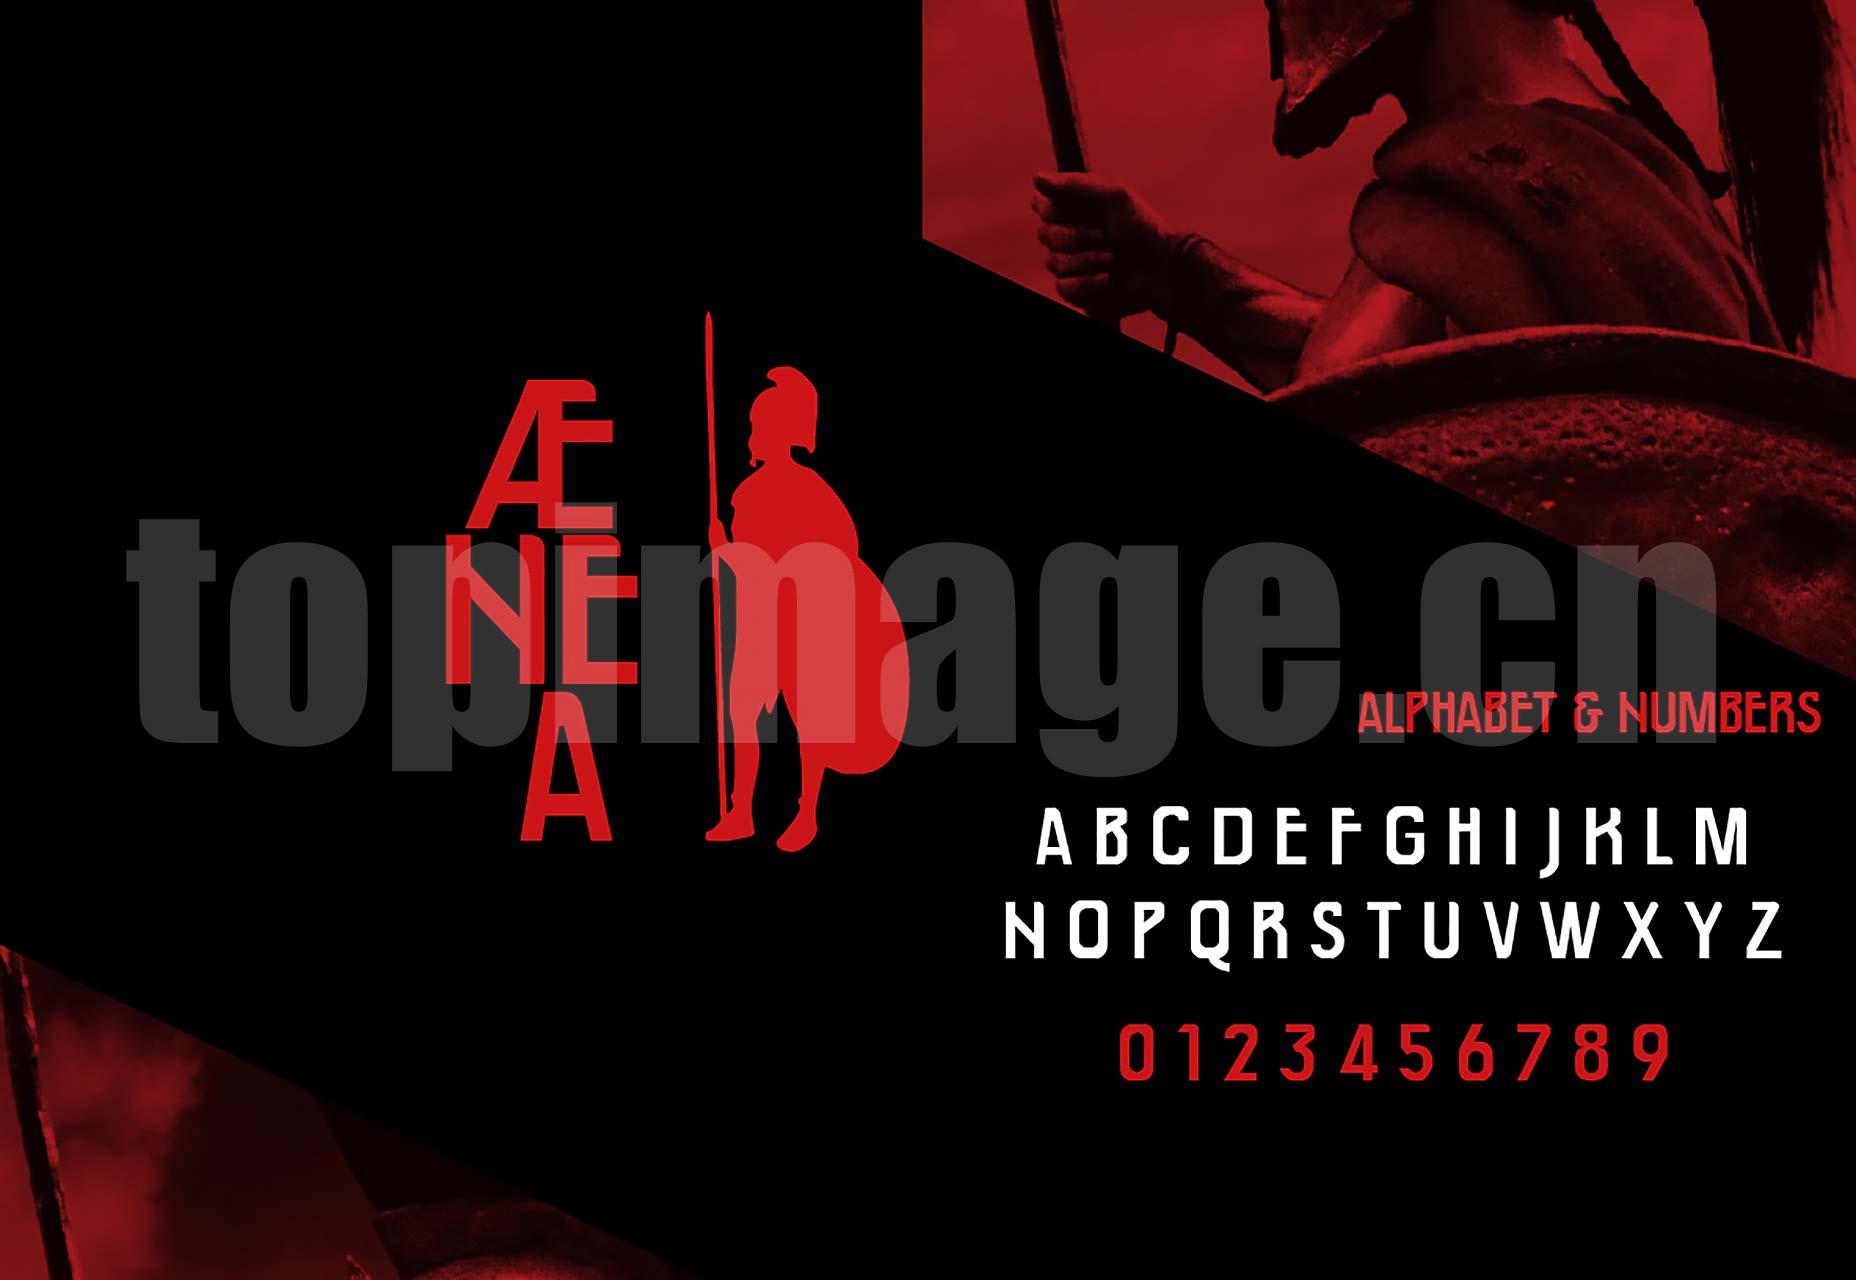 Aenea海报创意 经典个性 纤细logo英文字体下载